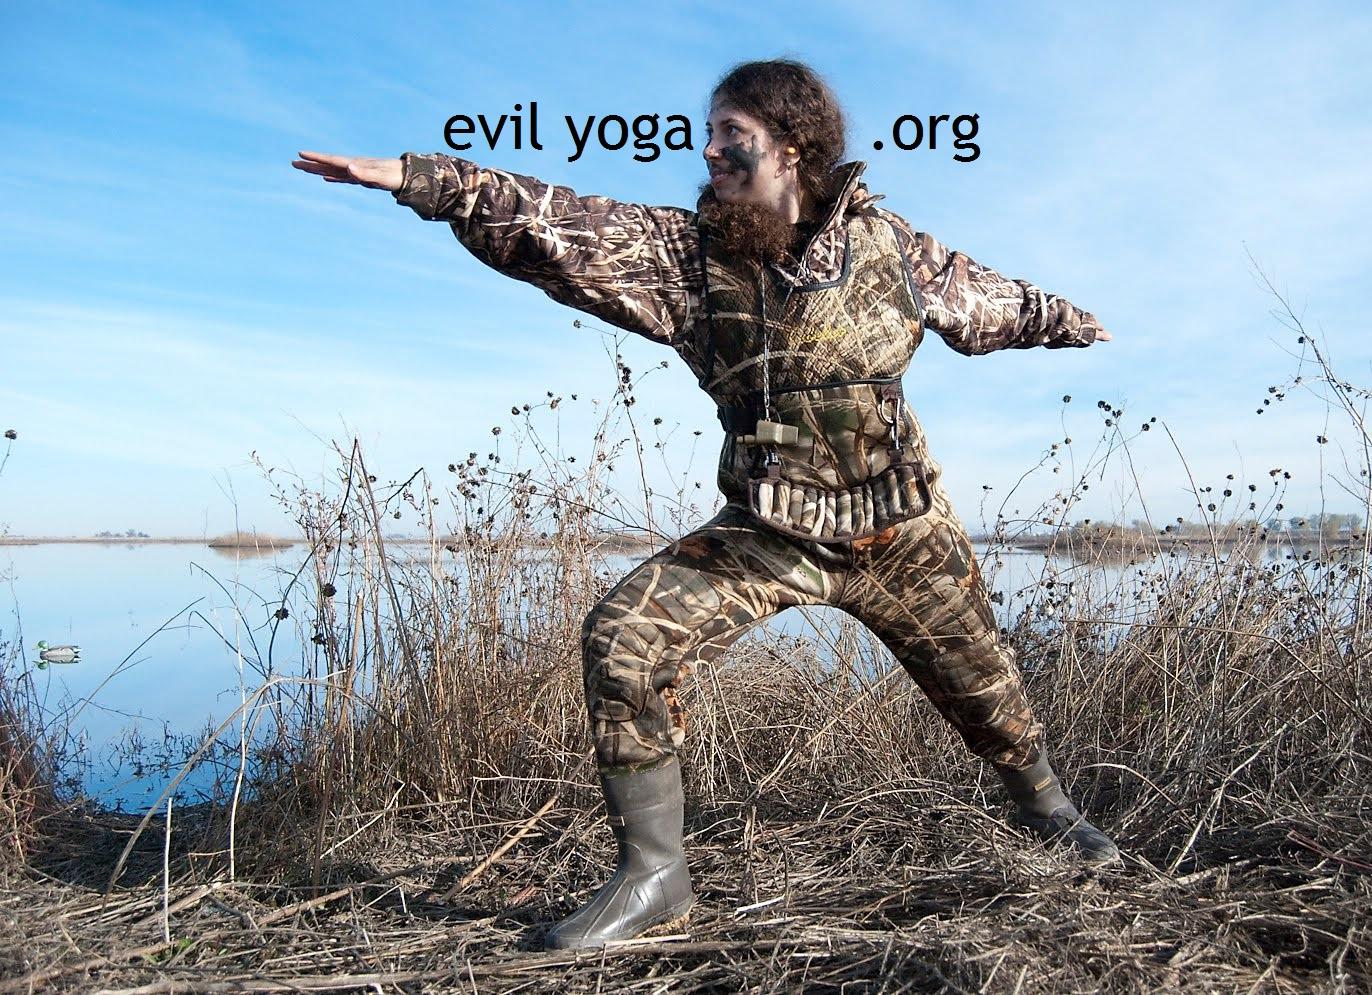 evil yoga